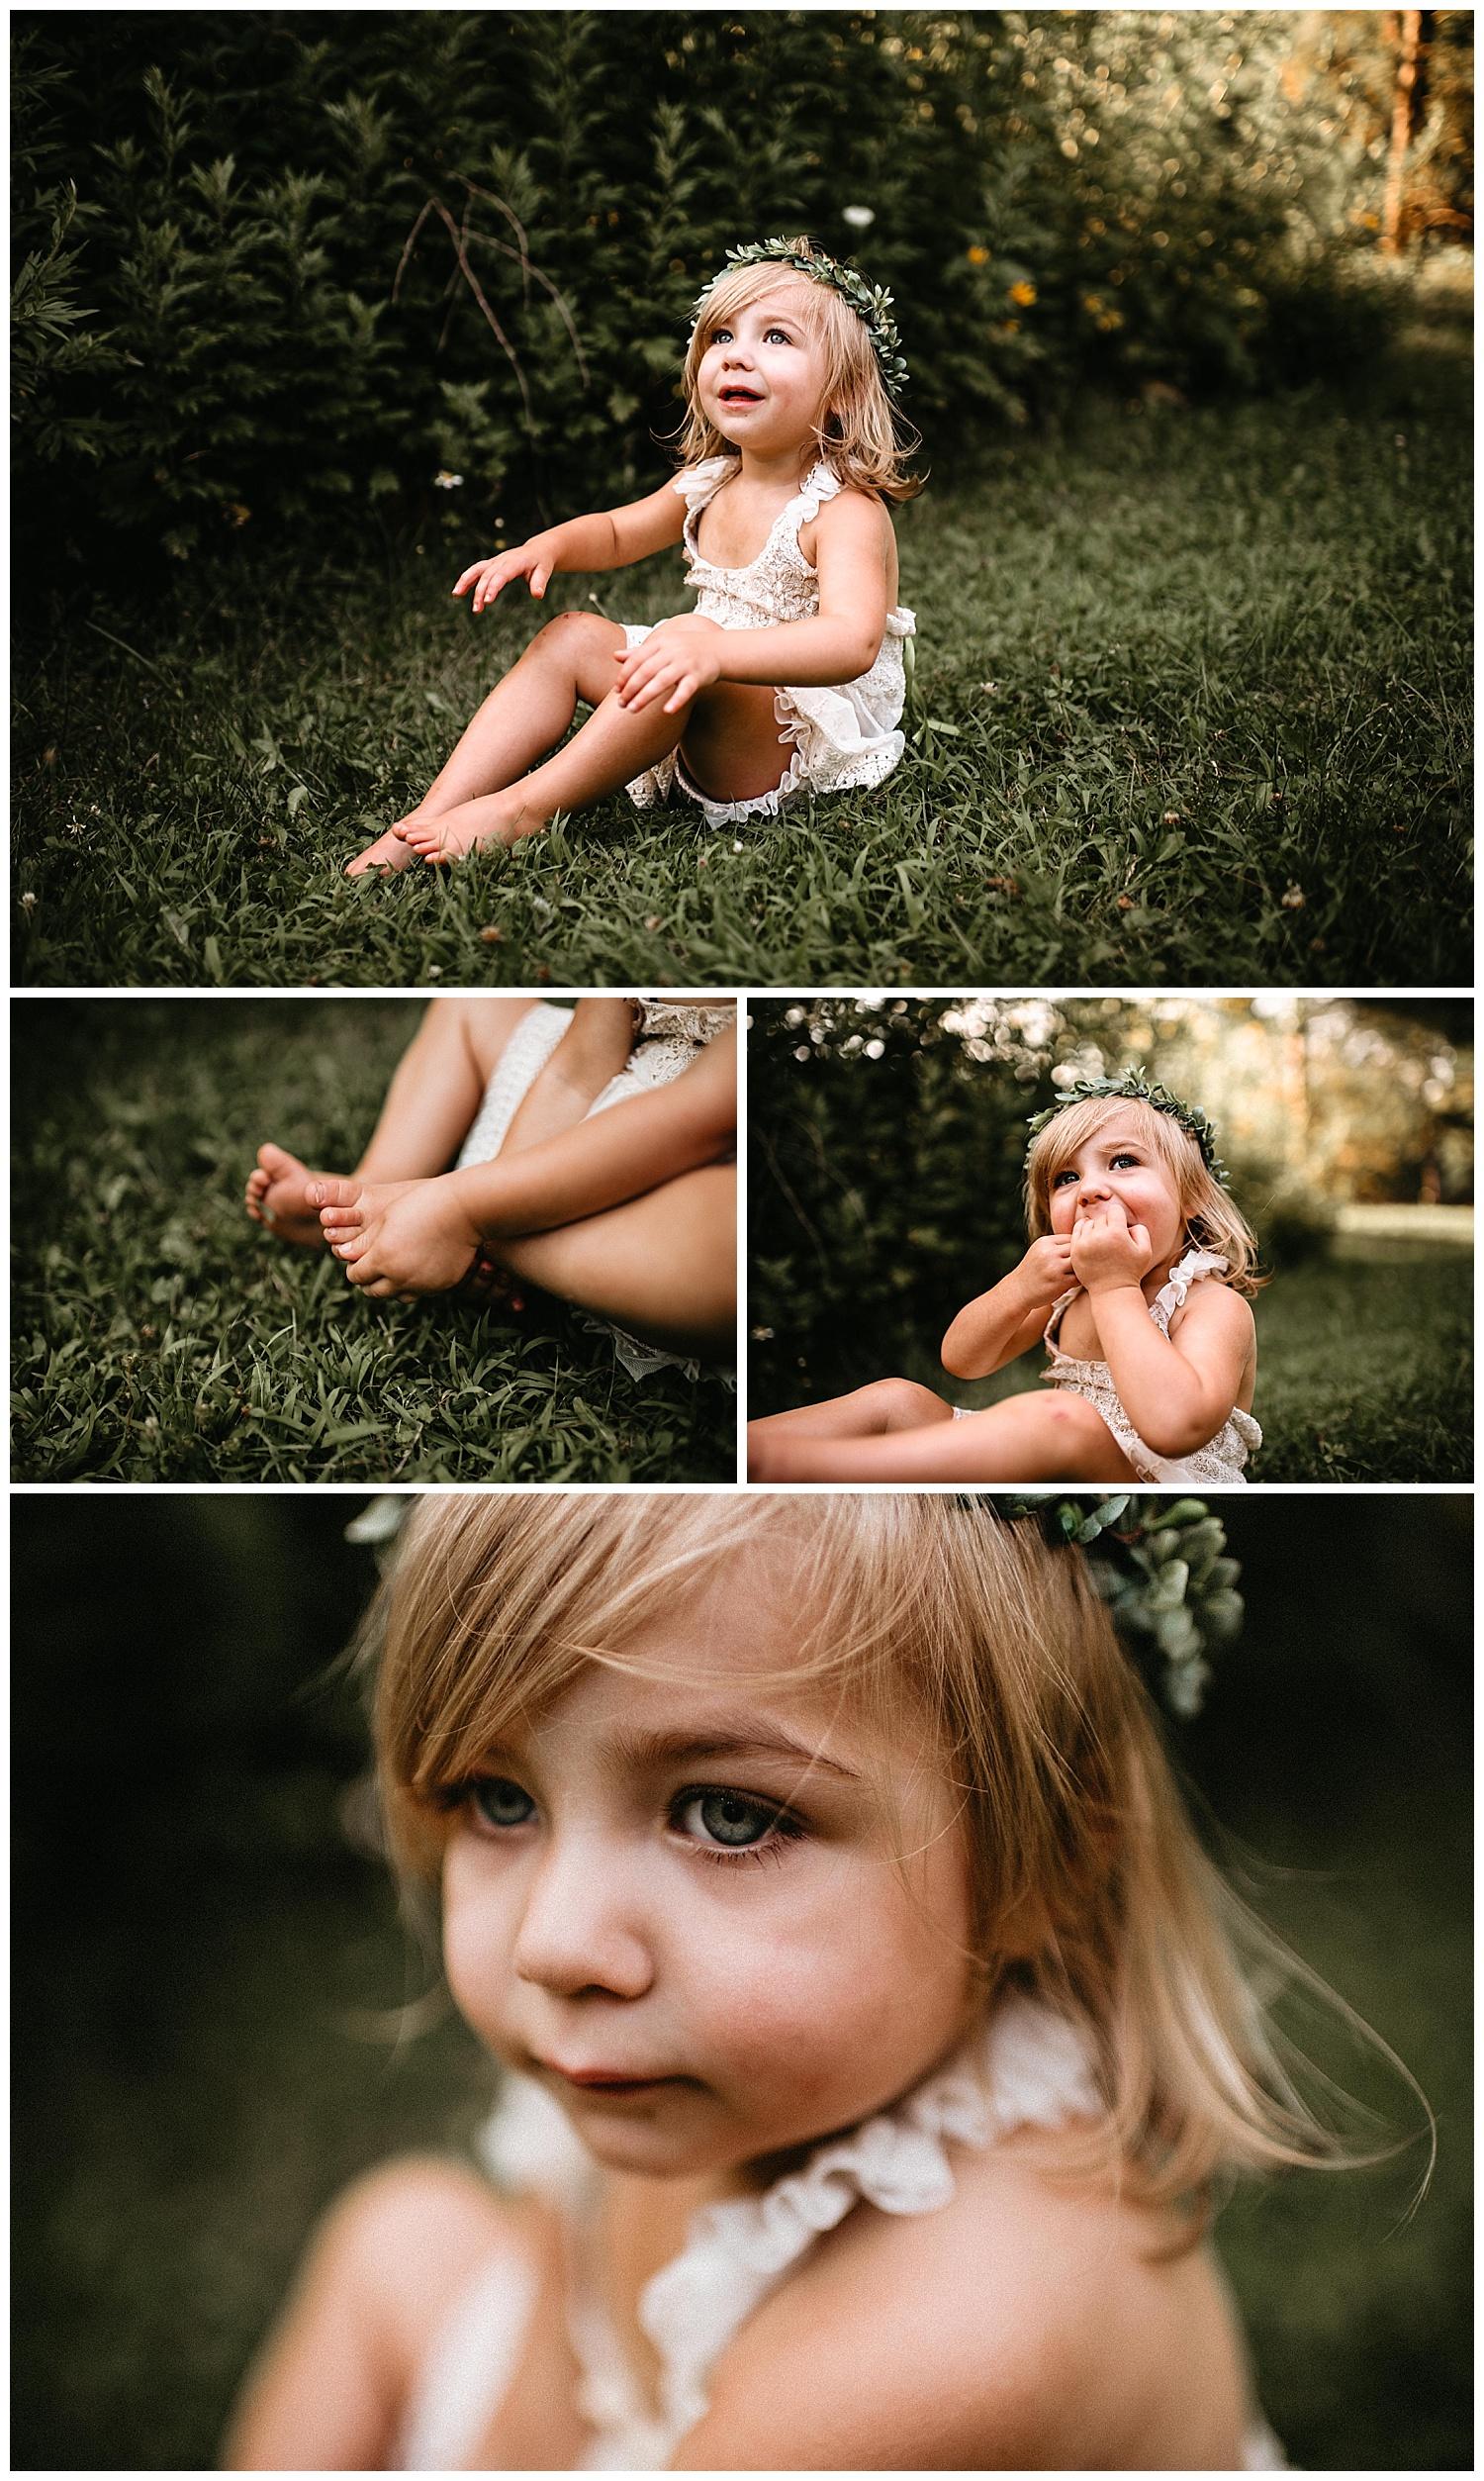 NEPA-Family-Photographer-in-Wilkes-Barre-PA_0161.jpg